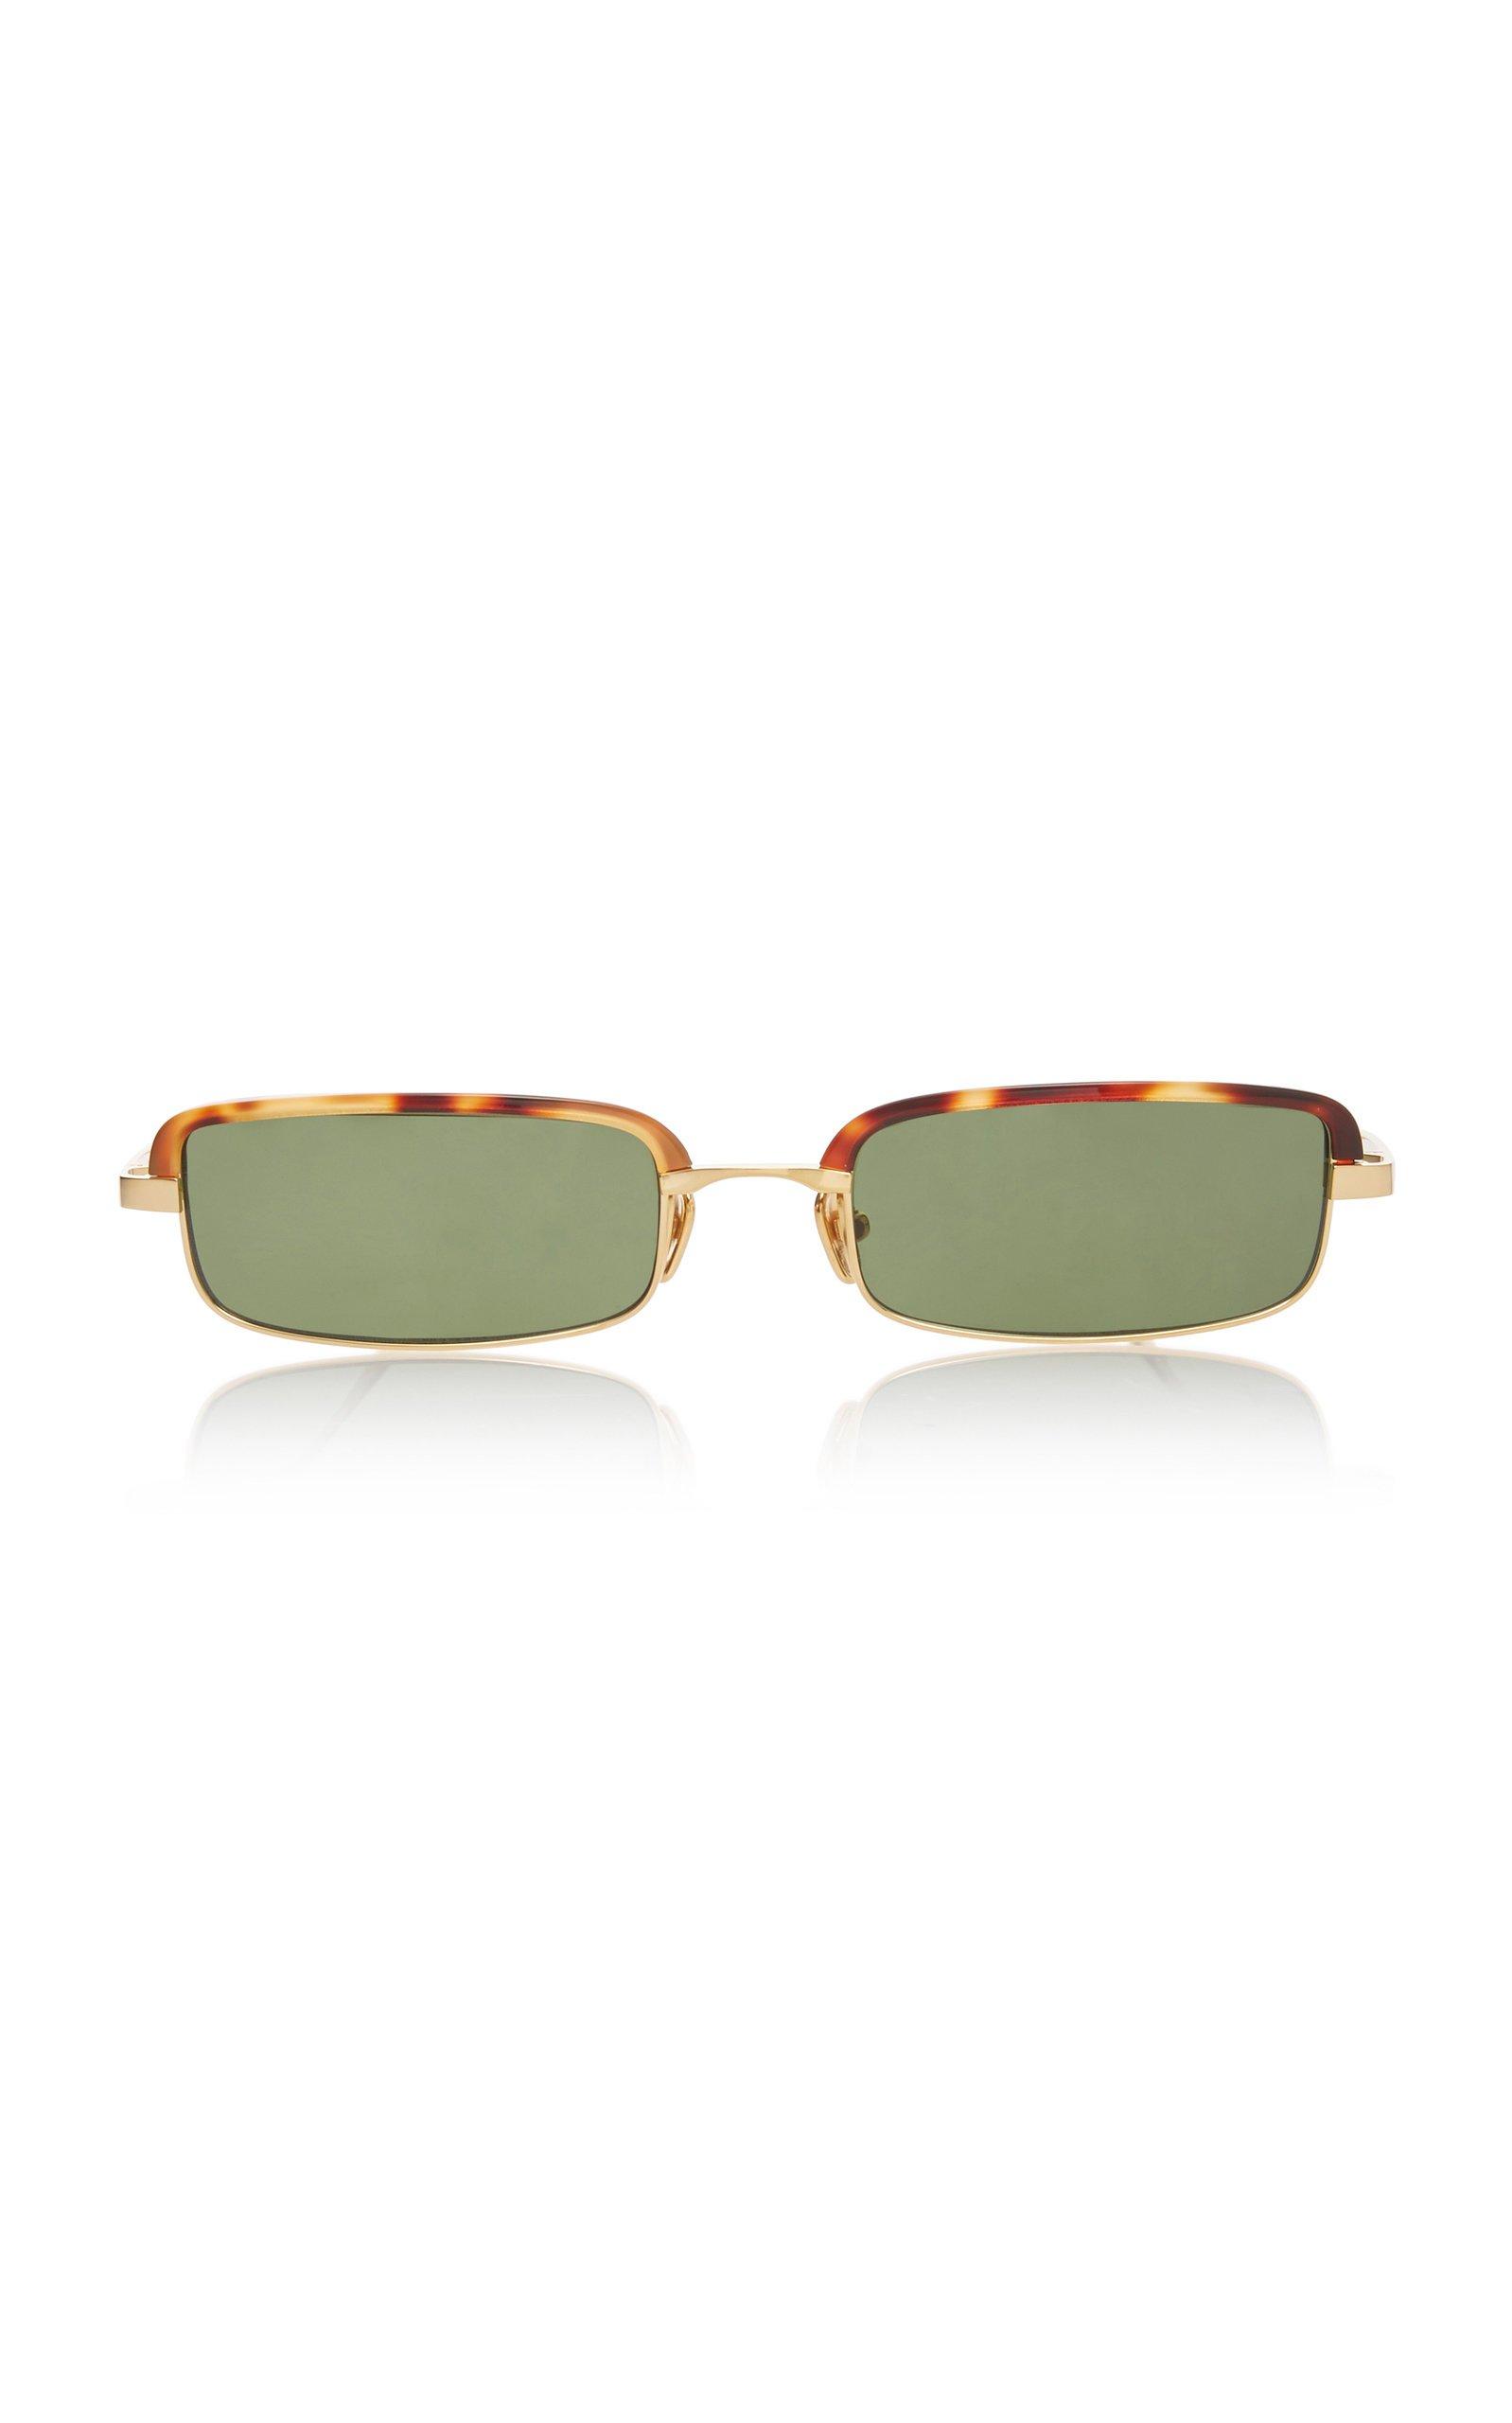 Linda Farrow Leona Stainless Steel Square-Frame Sunglasses